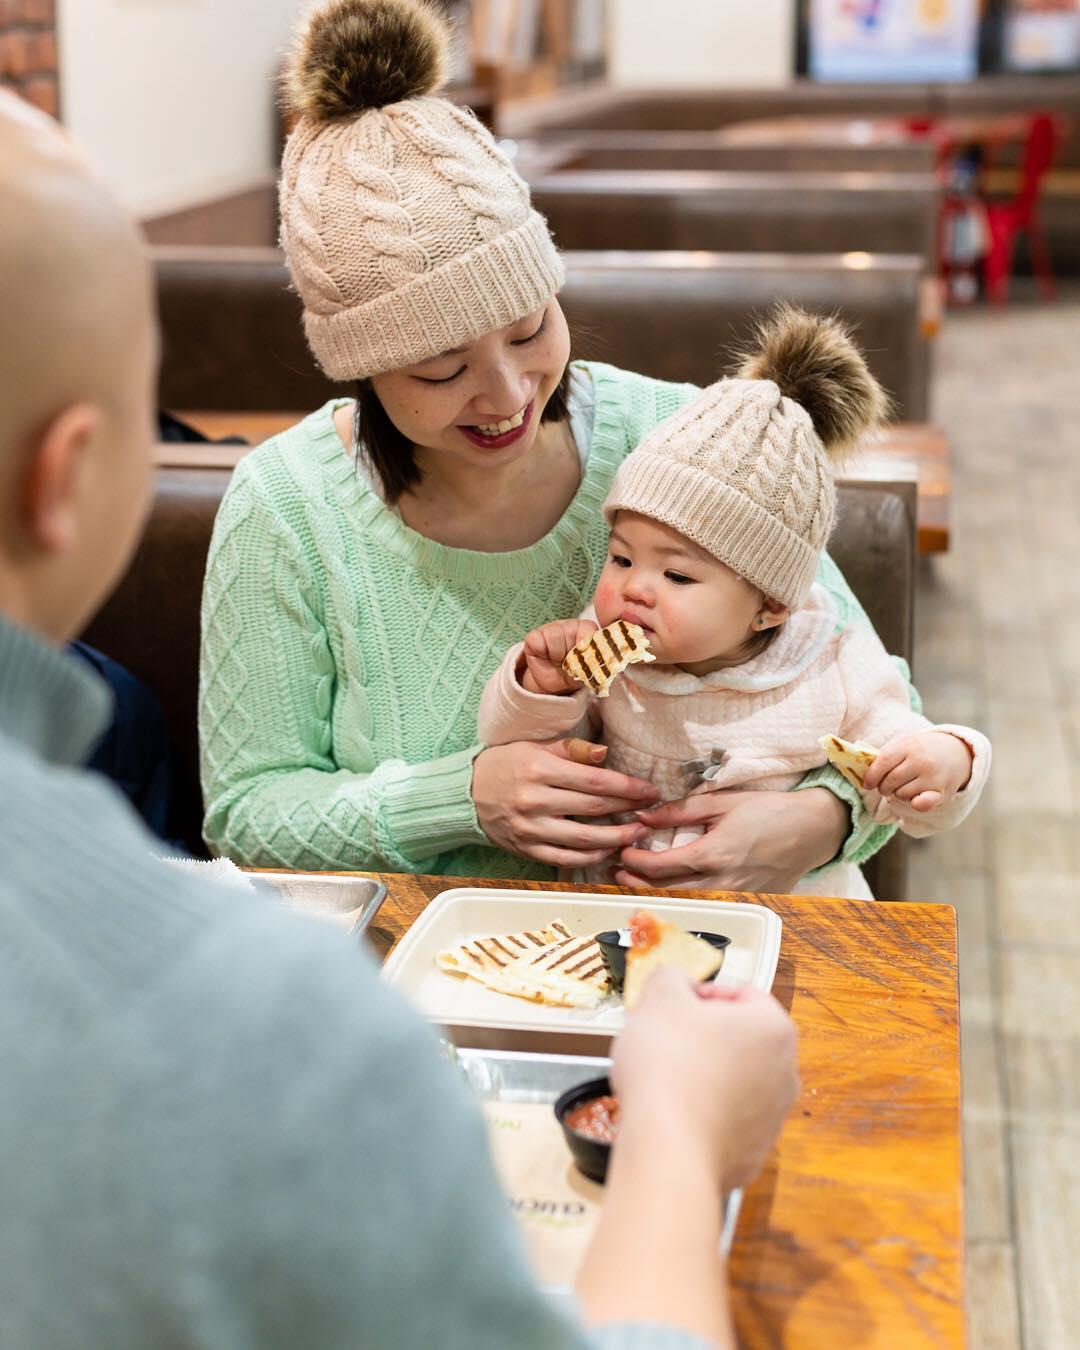 baby eats quesadilla from mucho burrito franchise